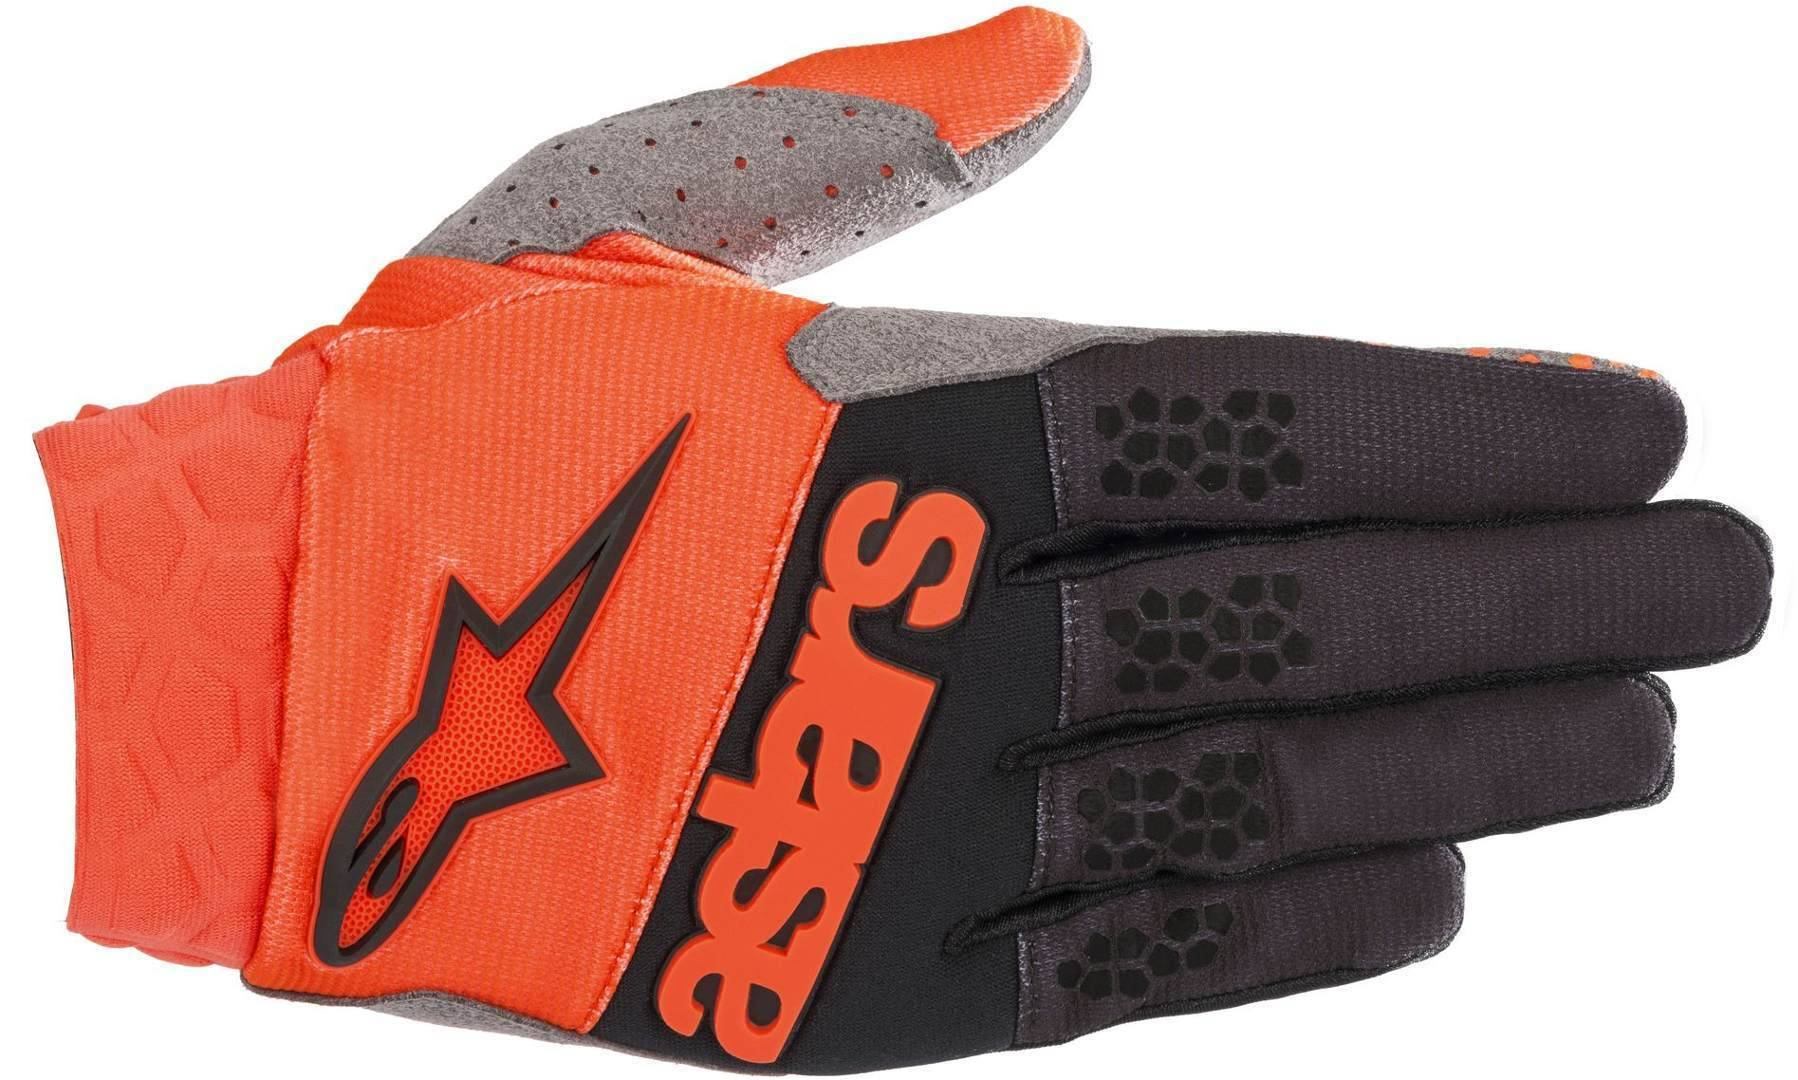 Alpinestars Racefend MX Textile Gloves Black Orange 2XL